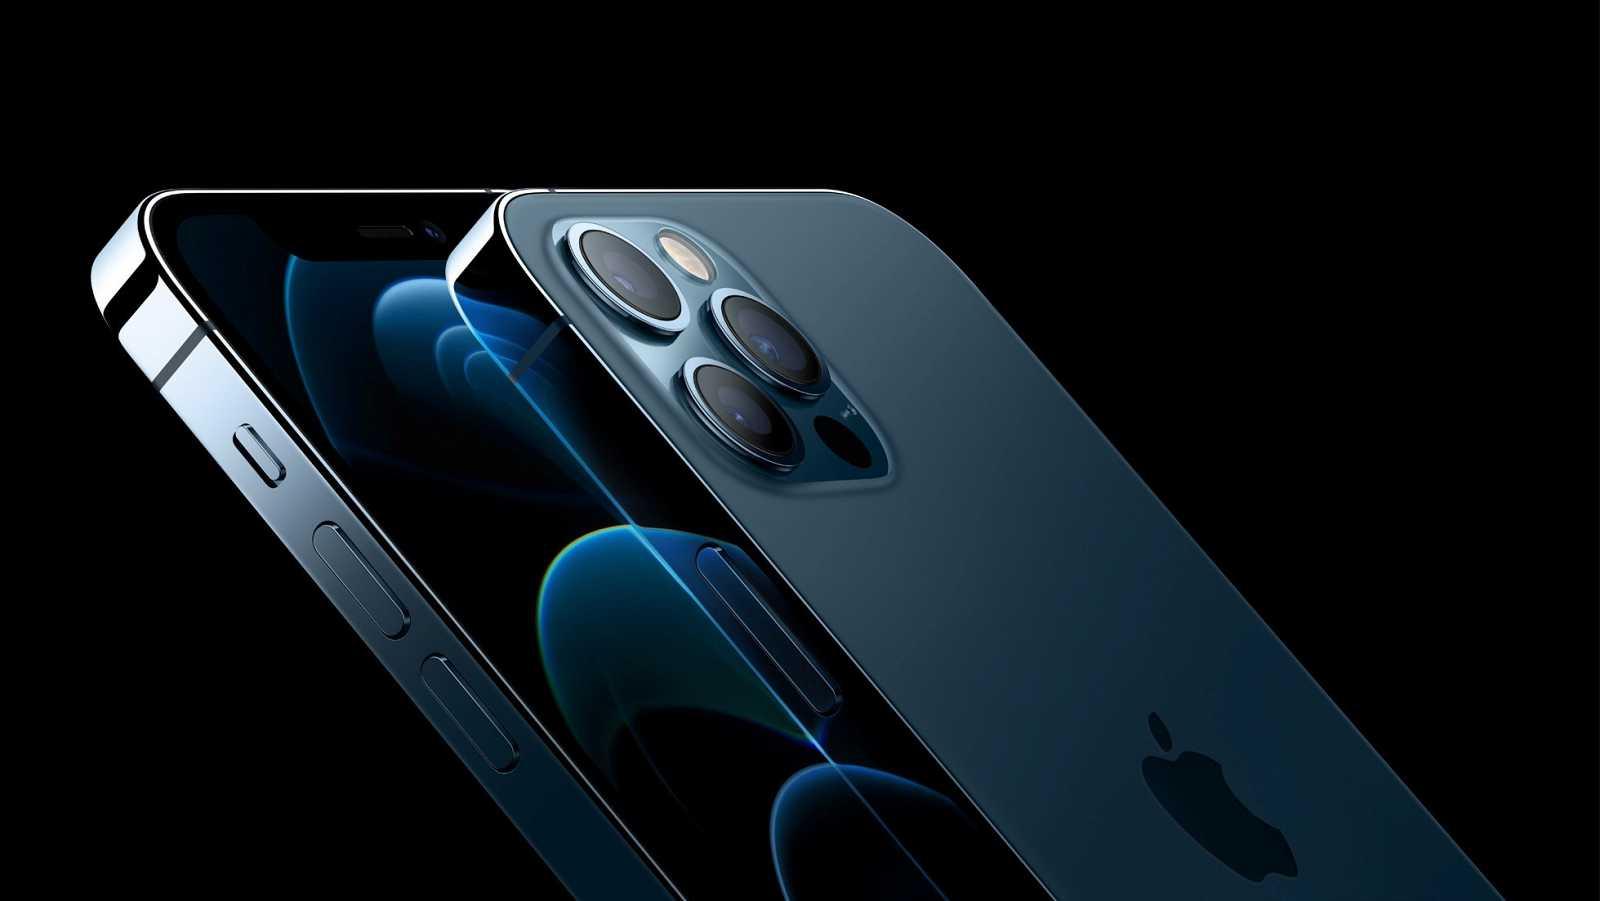 iPhone 12. Apple